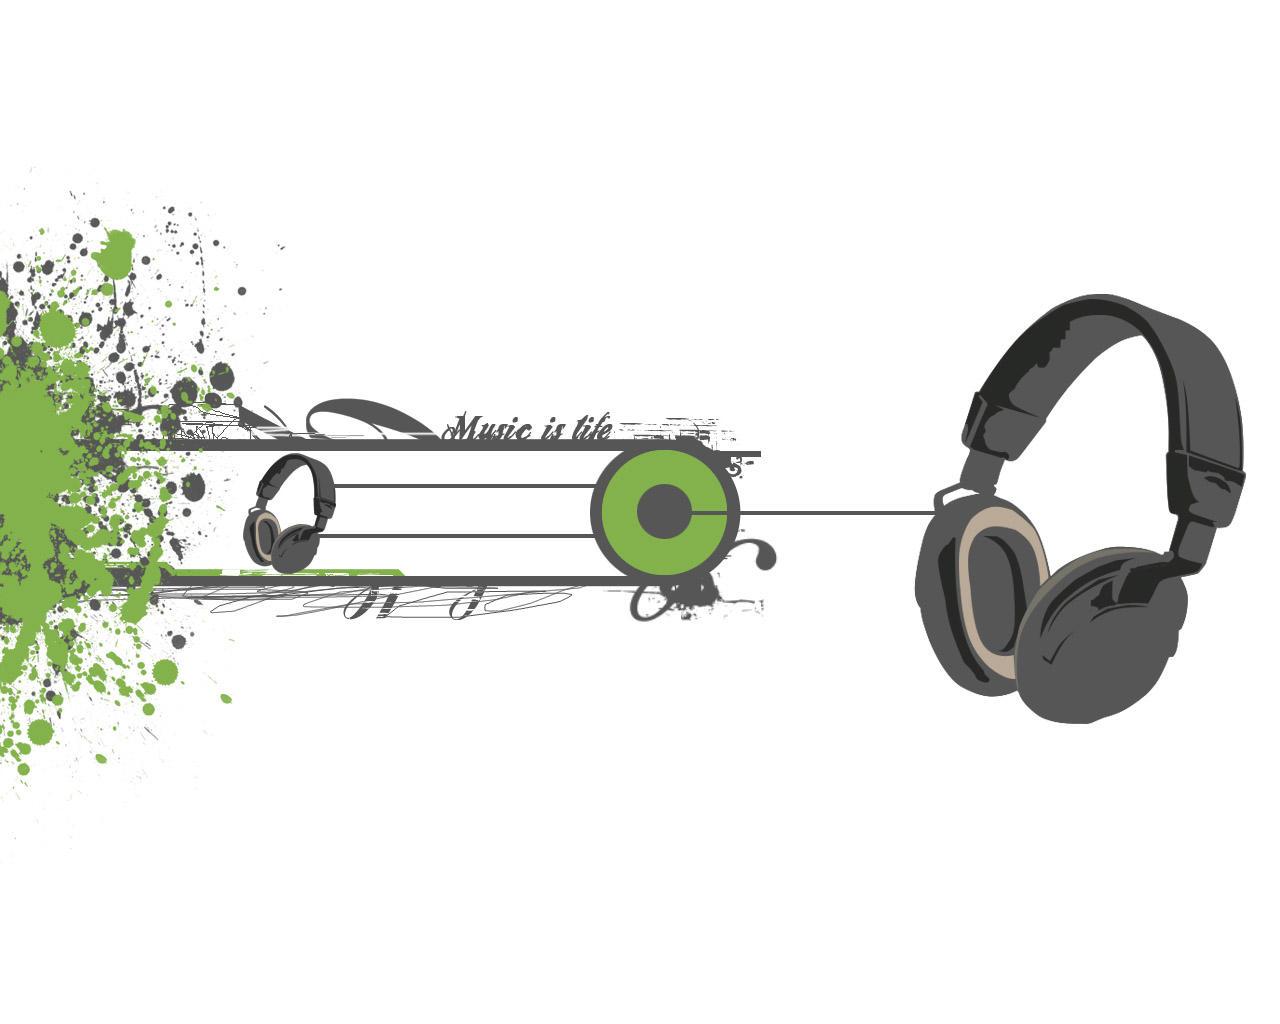 Music is life by mav899